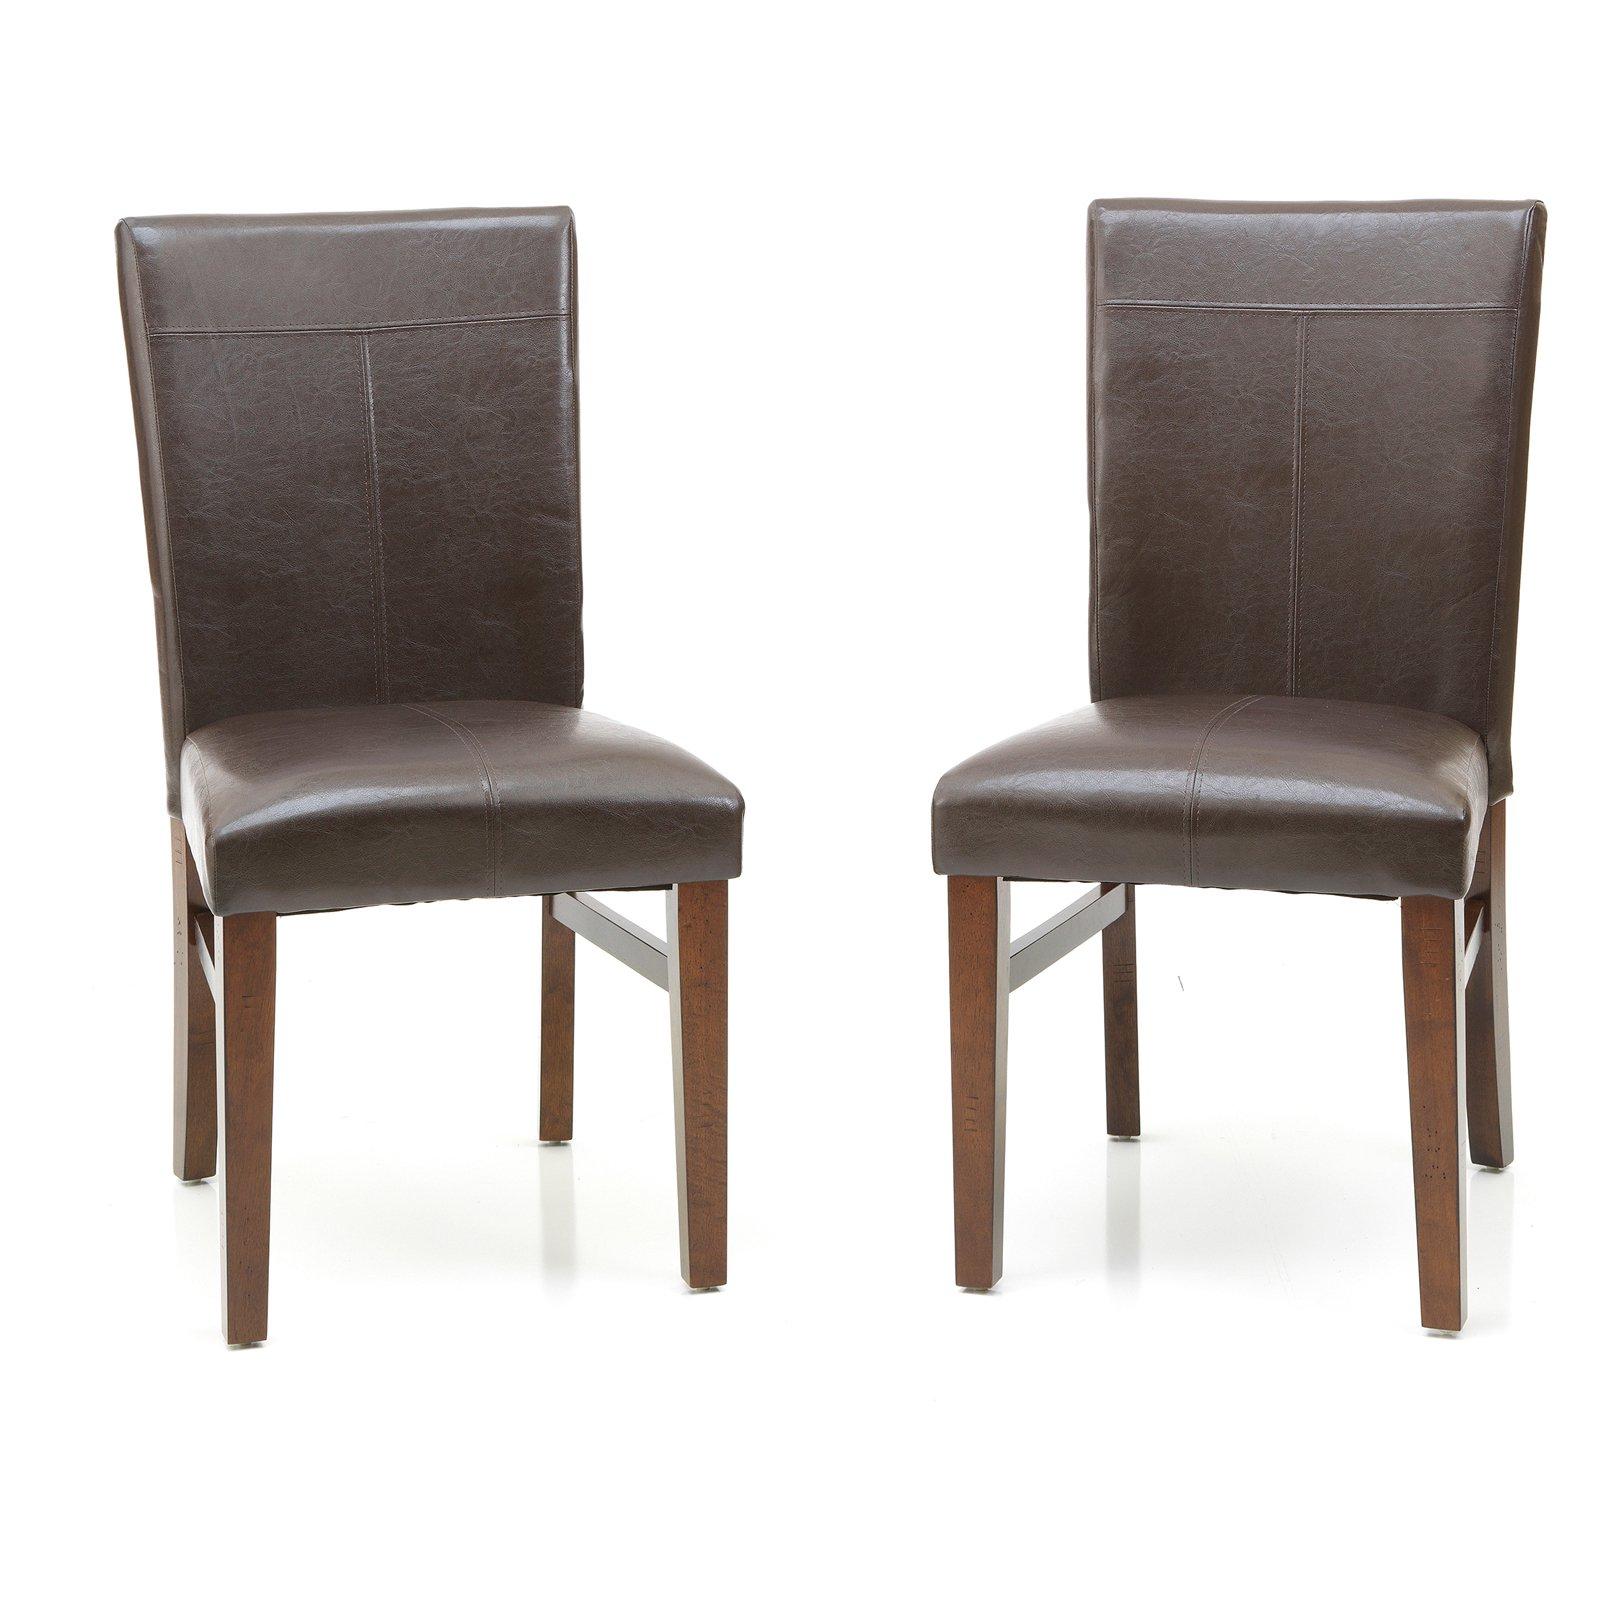 Imagio Home by Intercon Kailua Parson's Side Chair, Set of 2, Distressed Raisin